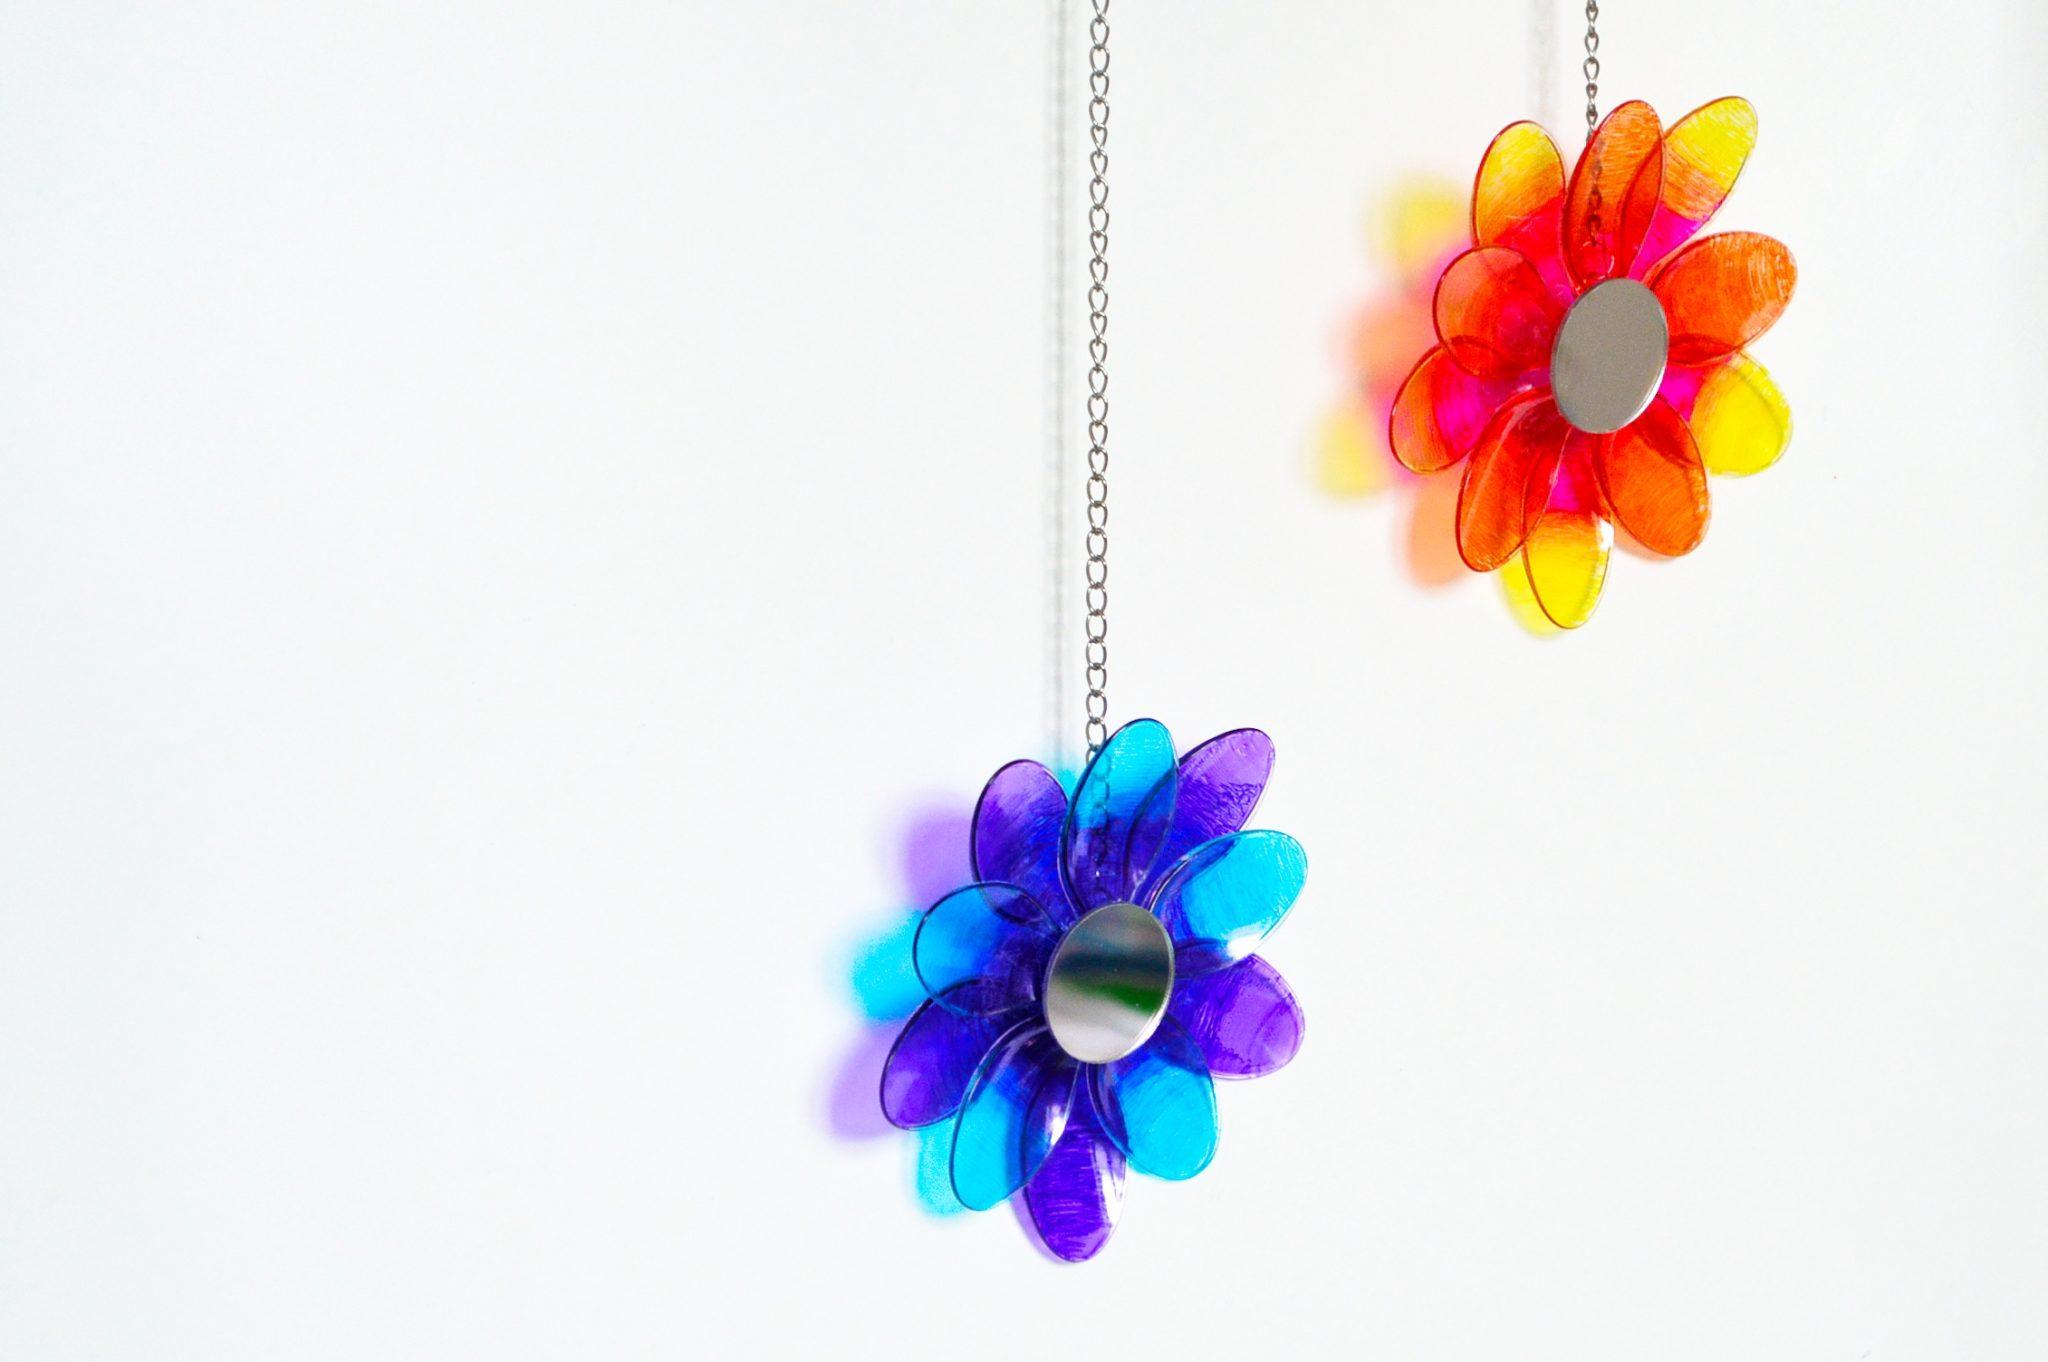 DIY Attrape-soleil recyclé - Suncatchers upcycling